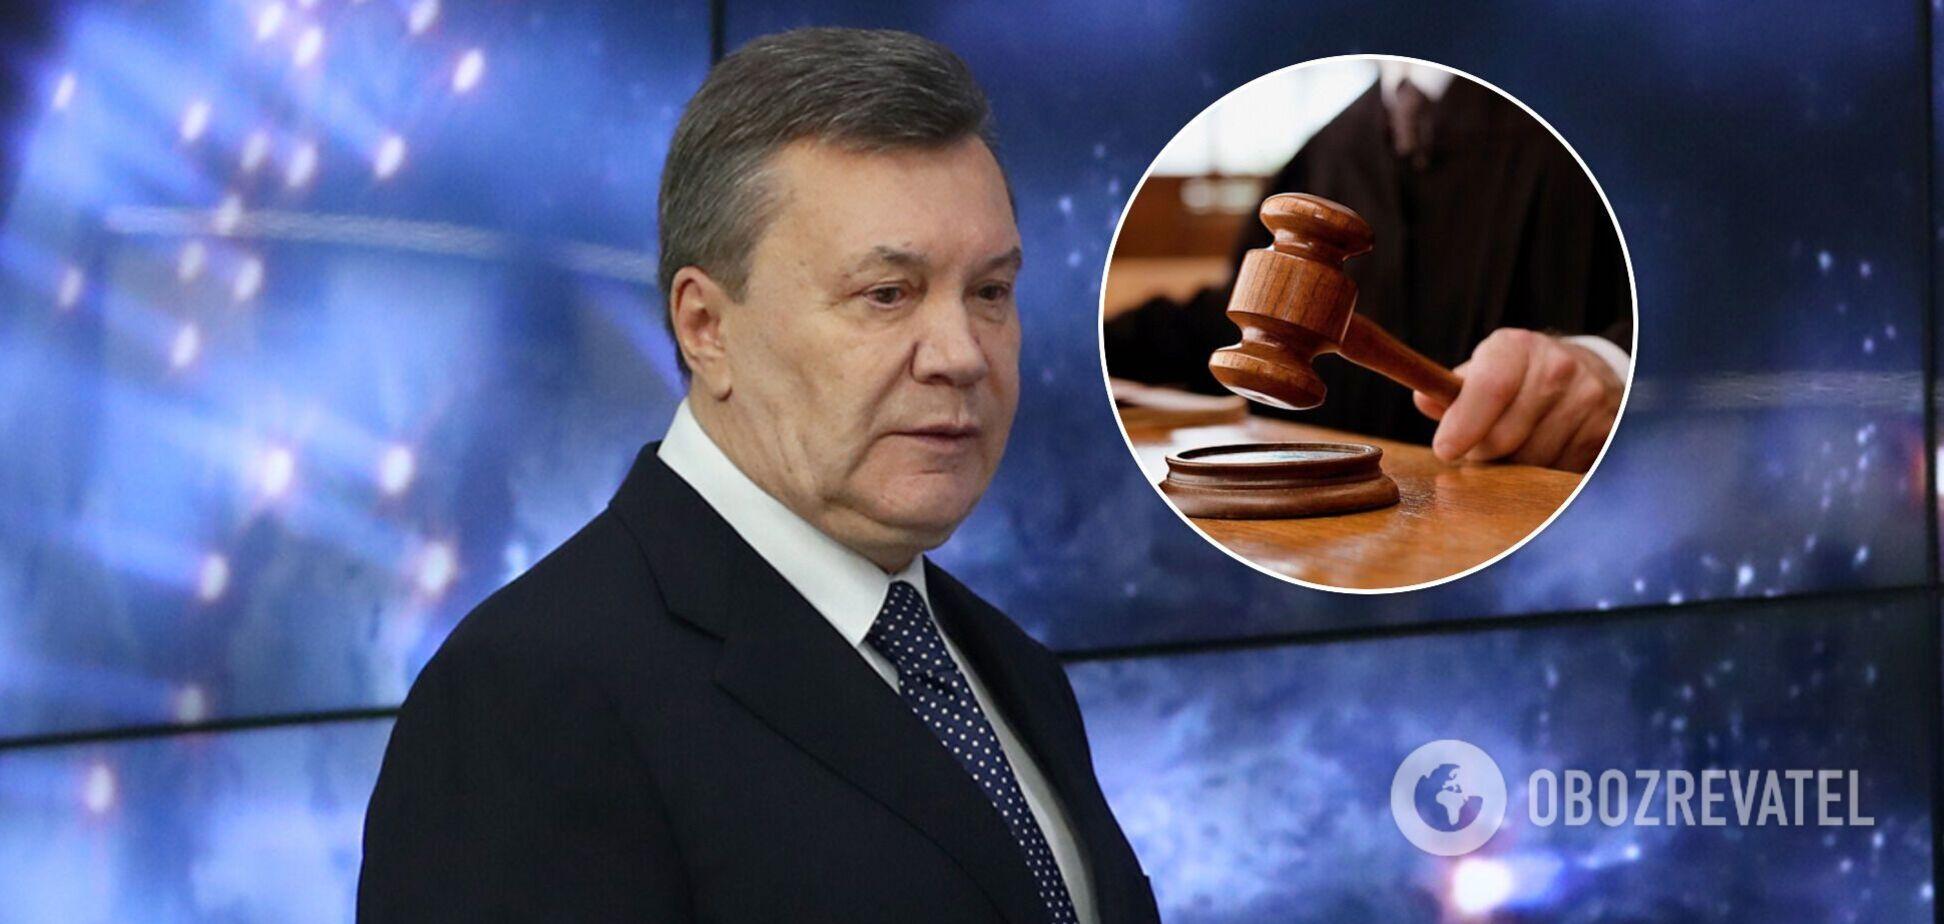 Януковичу отказали в апелляции по делу о захвате власти